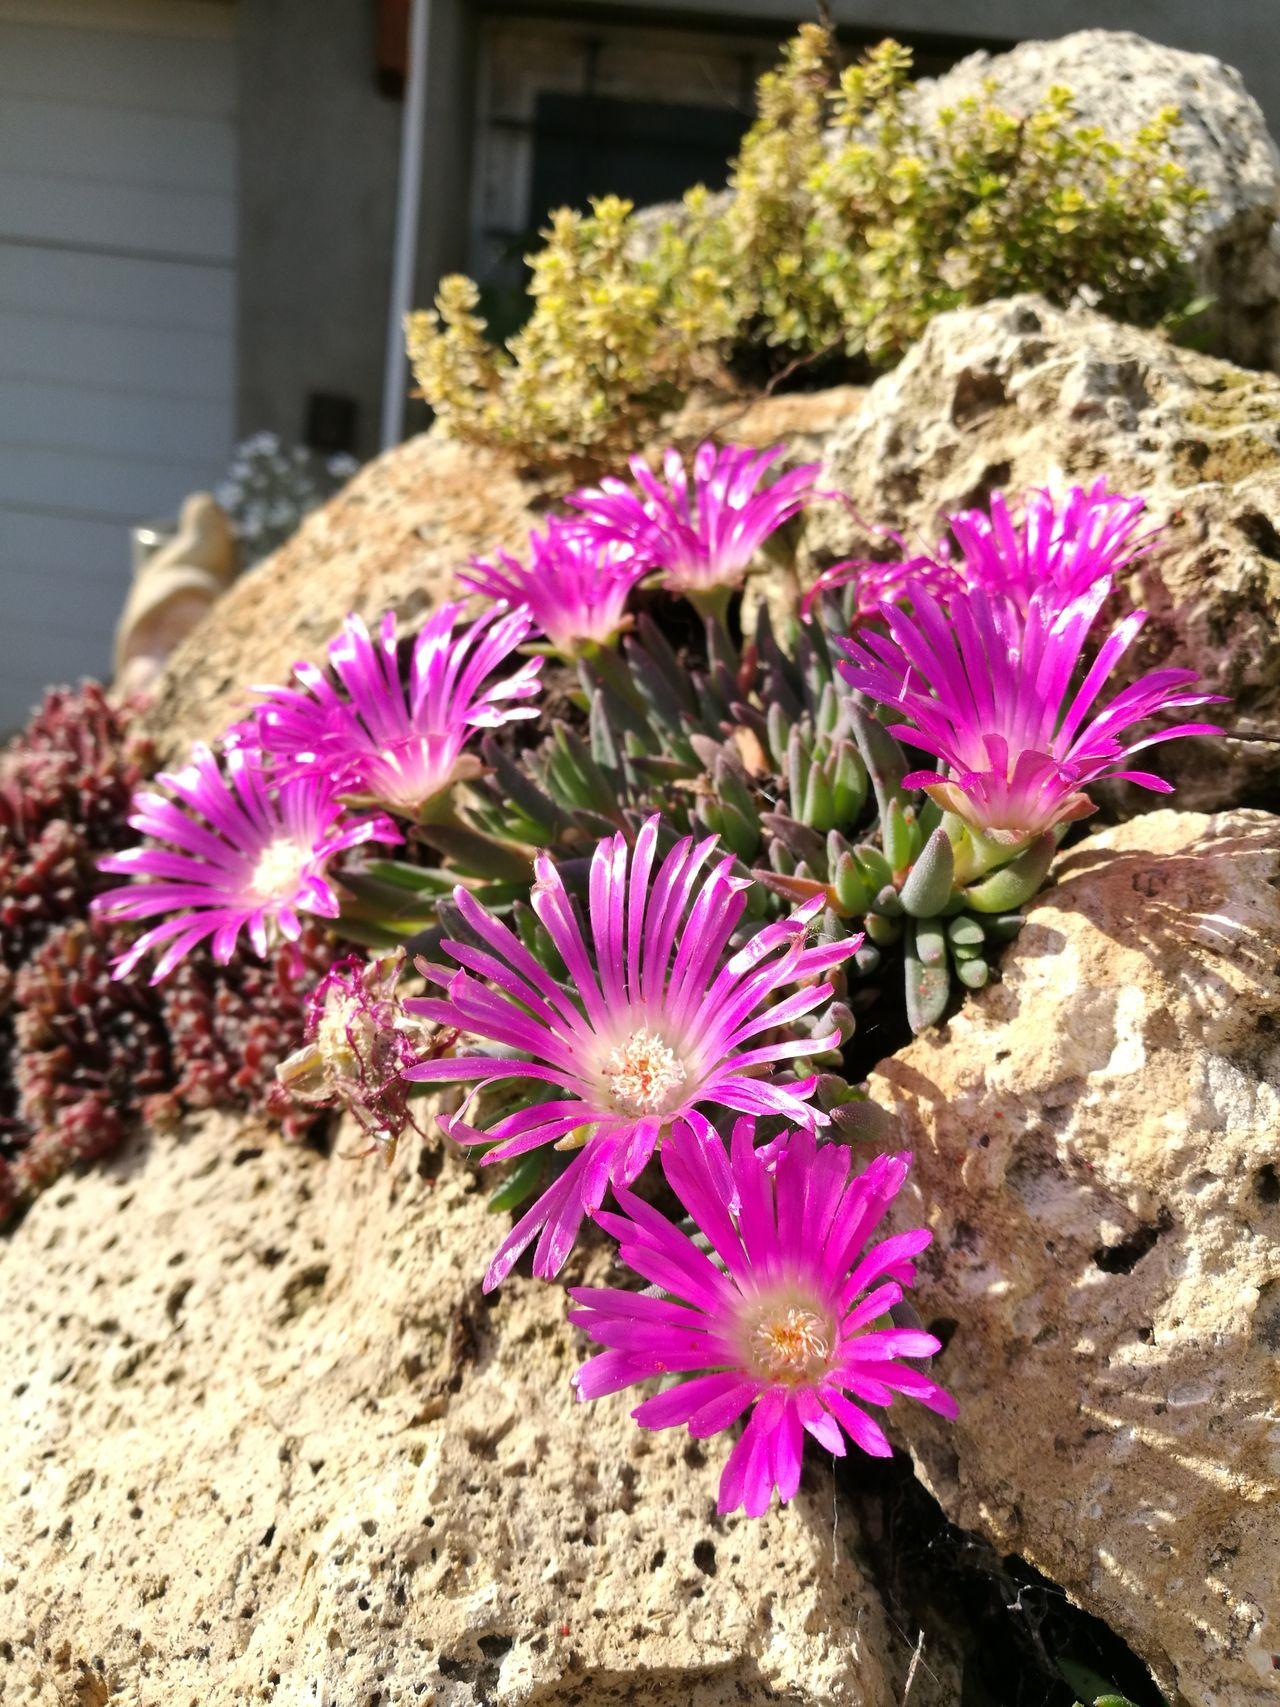 First Eyeem Photo Flowers Puprle Flower Rock And Flowers Rock Gardens